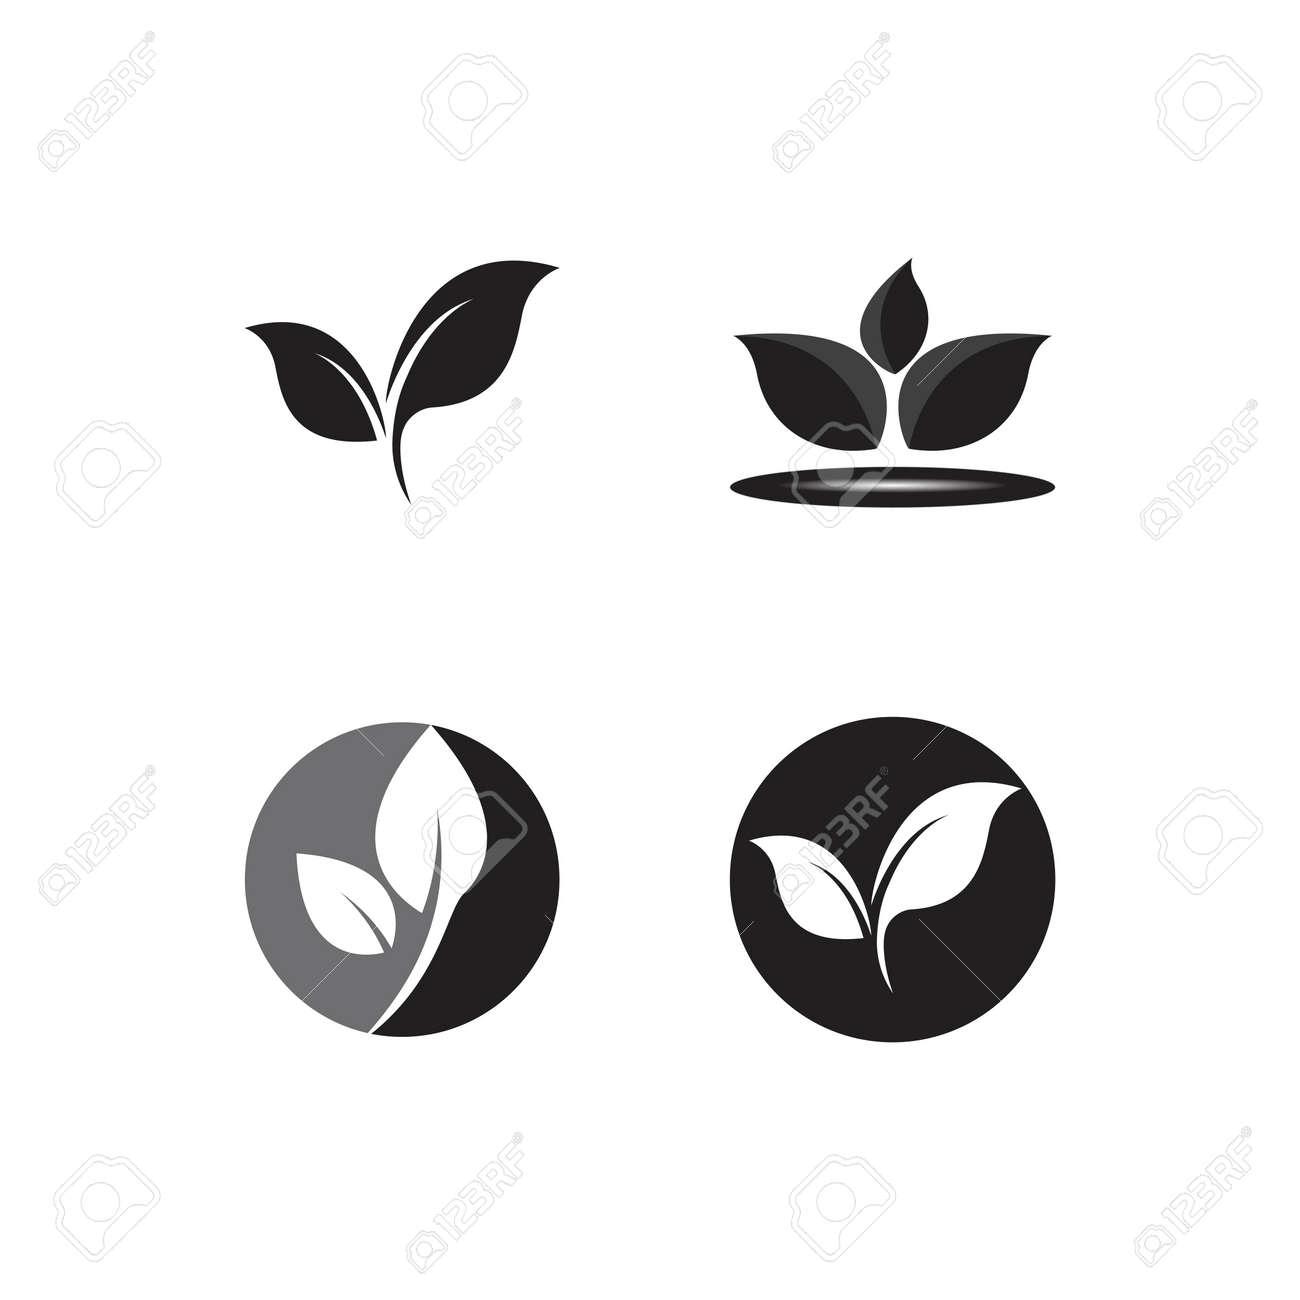 leaf logo ecology nature element vector icon - 155607375